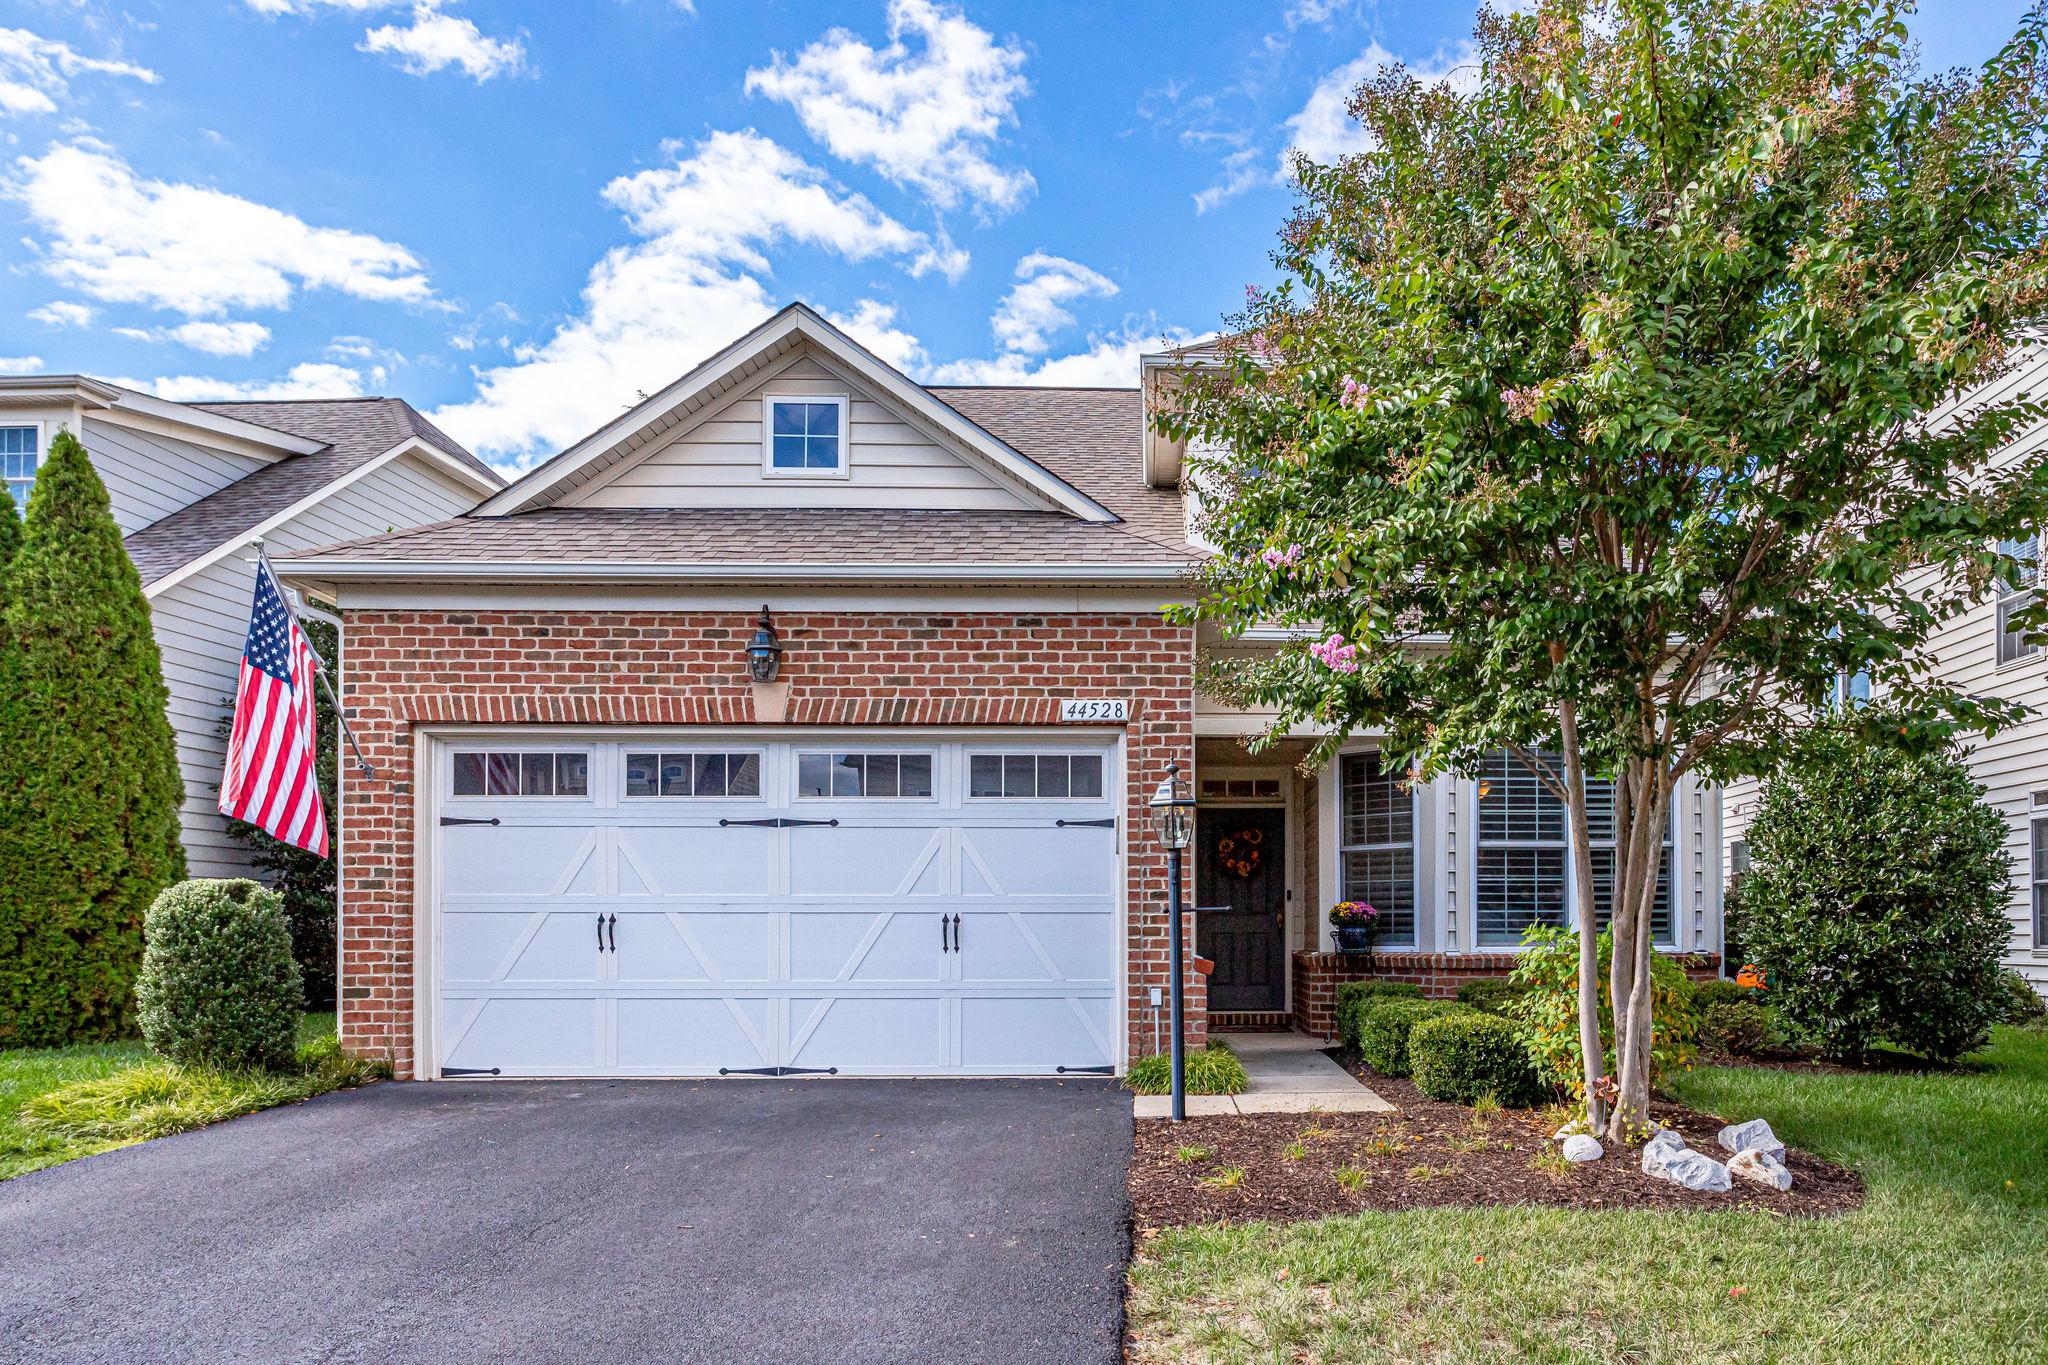 44528 Blueridge Meadows Dr, Potomac Green- For Sale